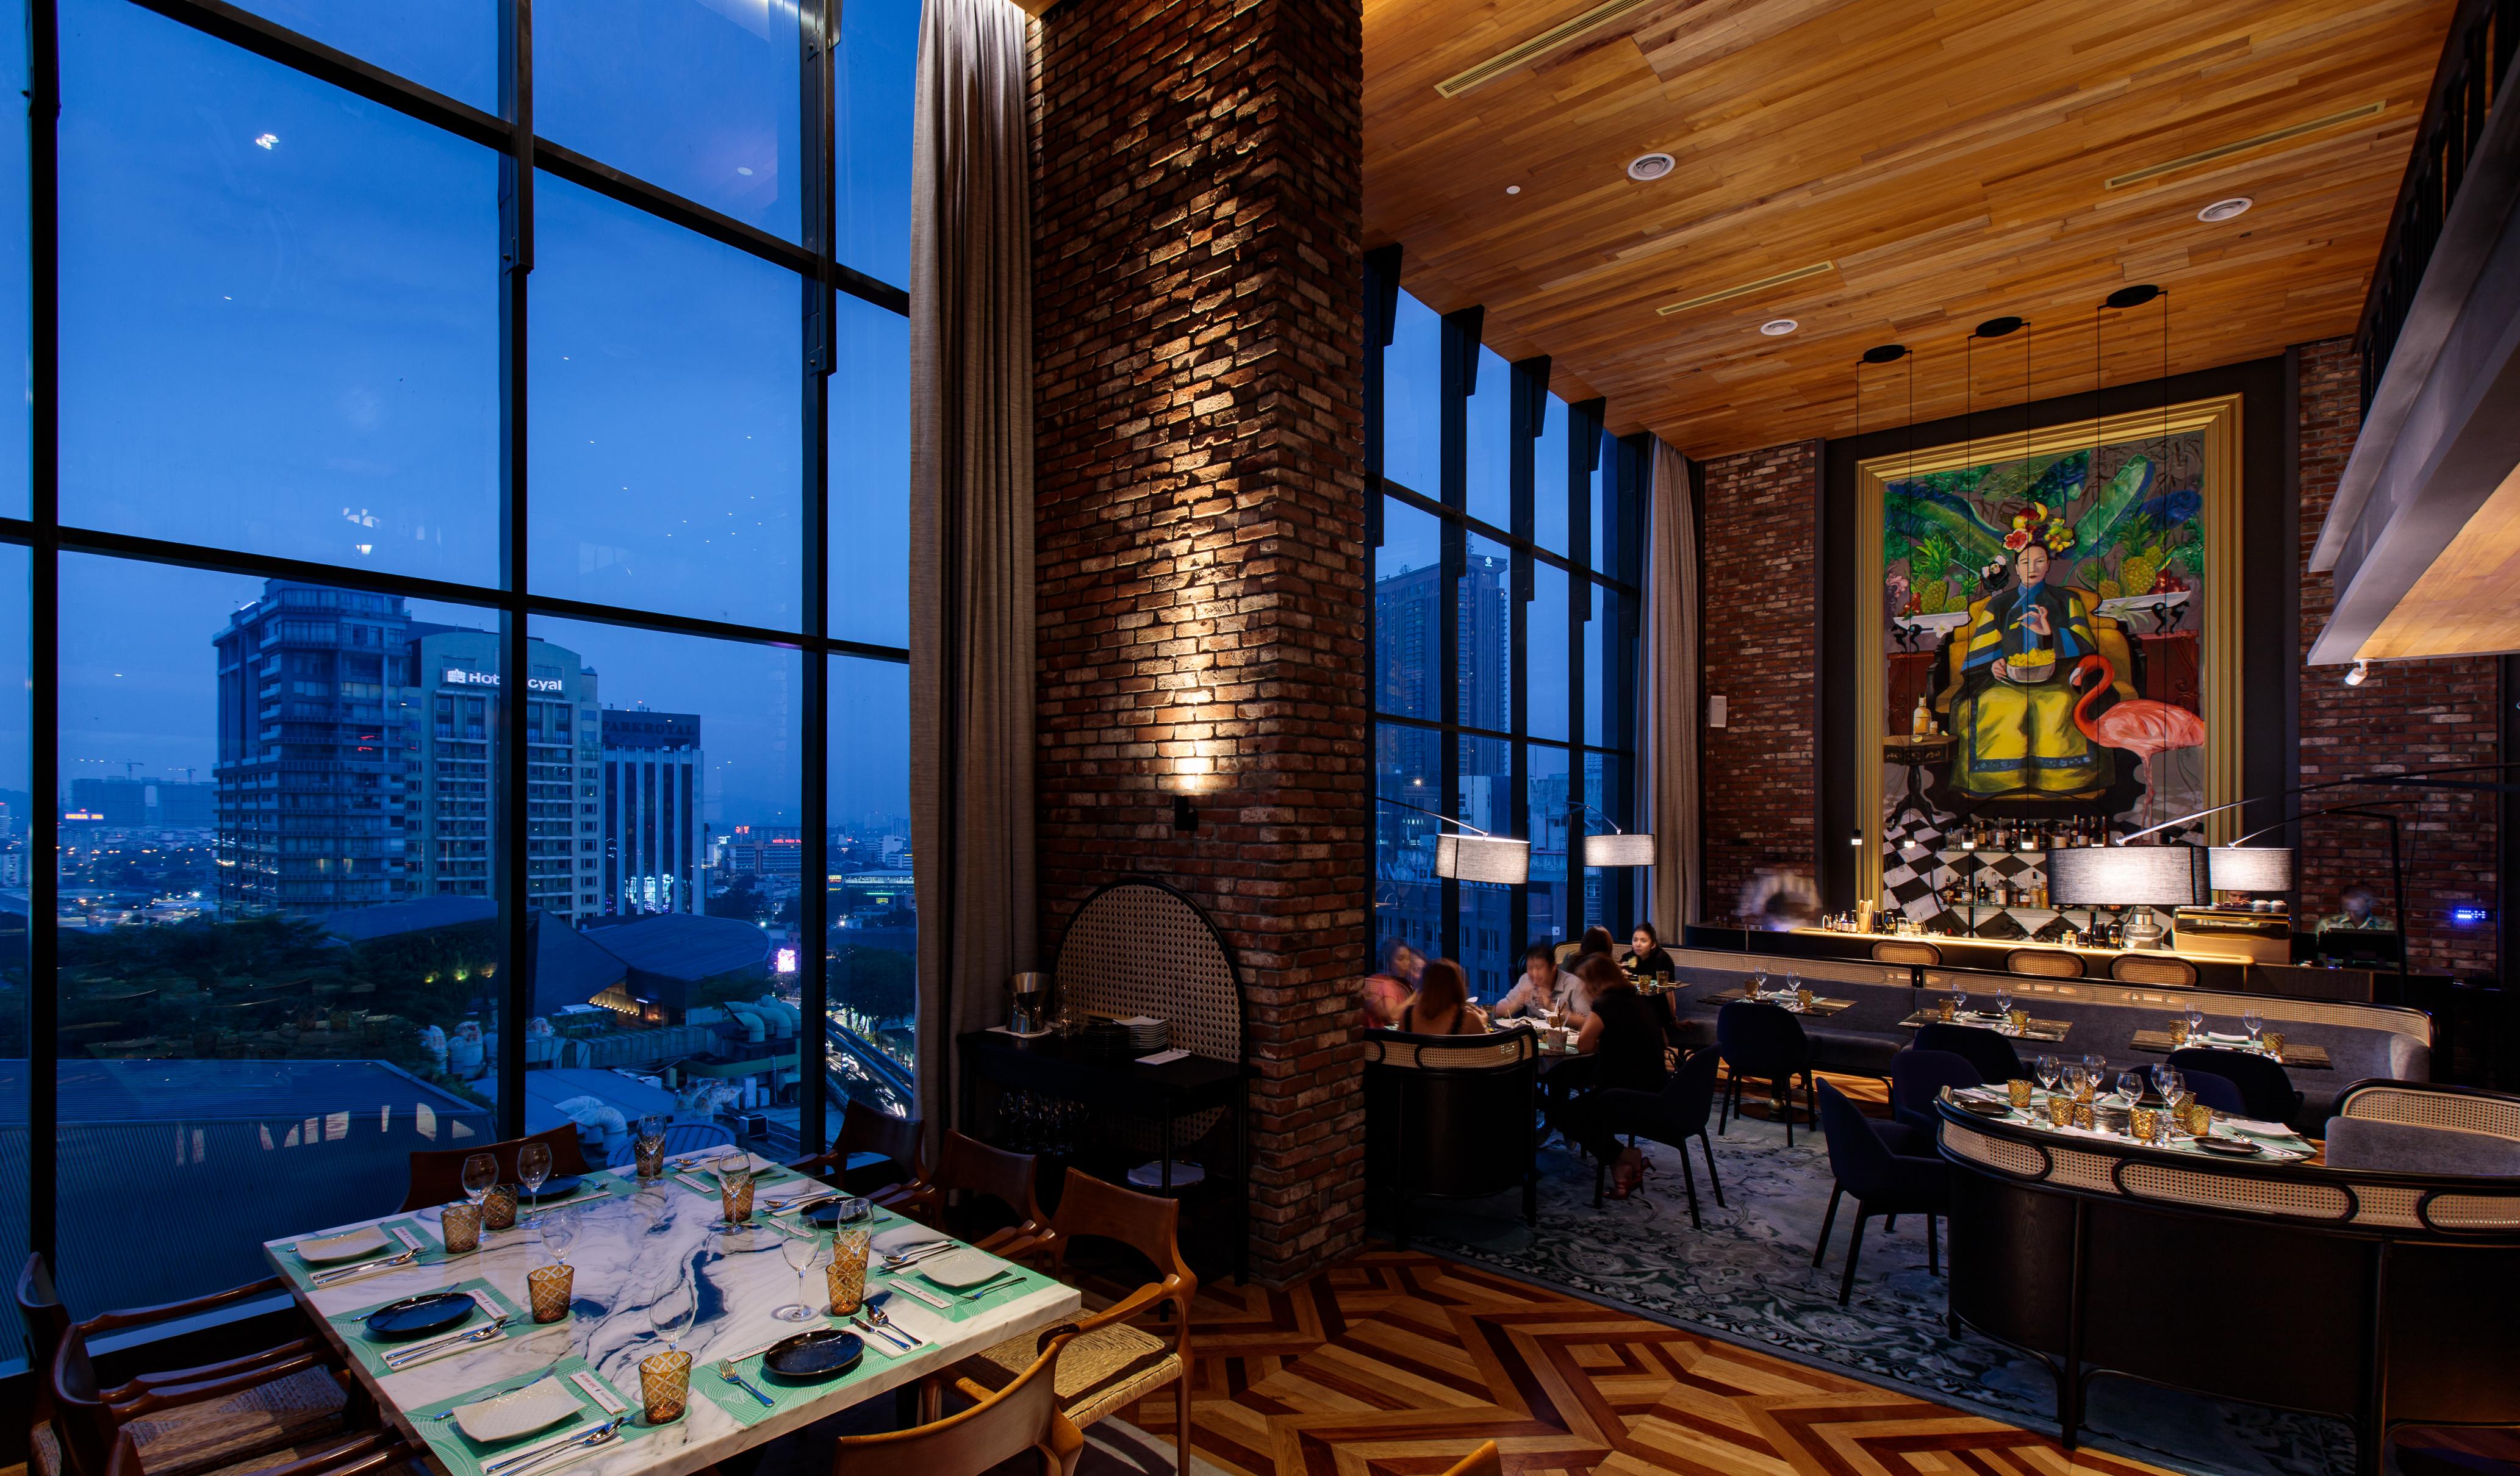 The sexy dining room at Mr. Chews Chino Latino